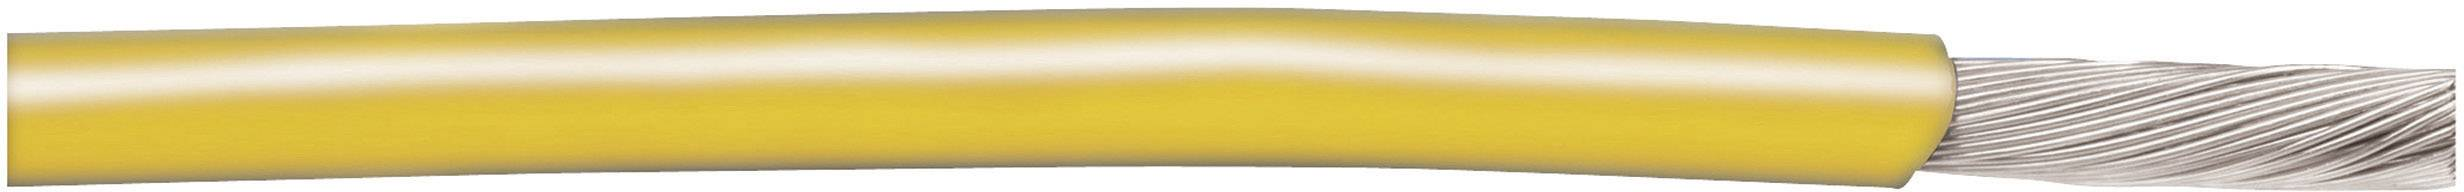 Opletenie / lanko AlphaWire 3053 WH001 1 x 0.50 mm², vonkajší Ø 1.75 mm, metrový tovar